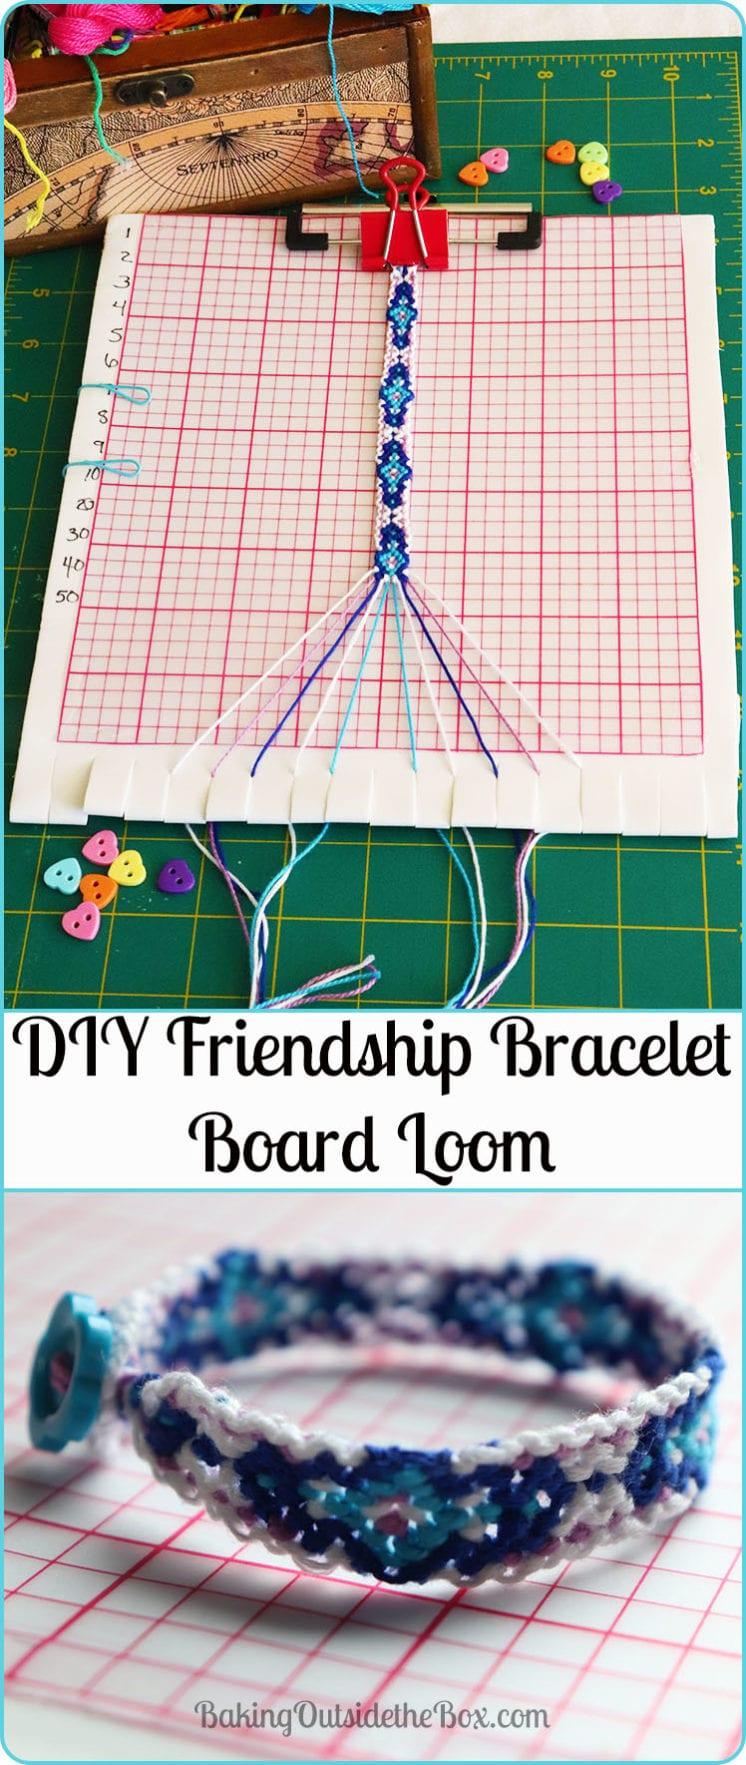 Diy Friendship Bracelet Board Loom Creating Baking